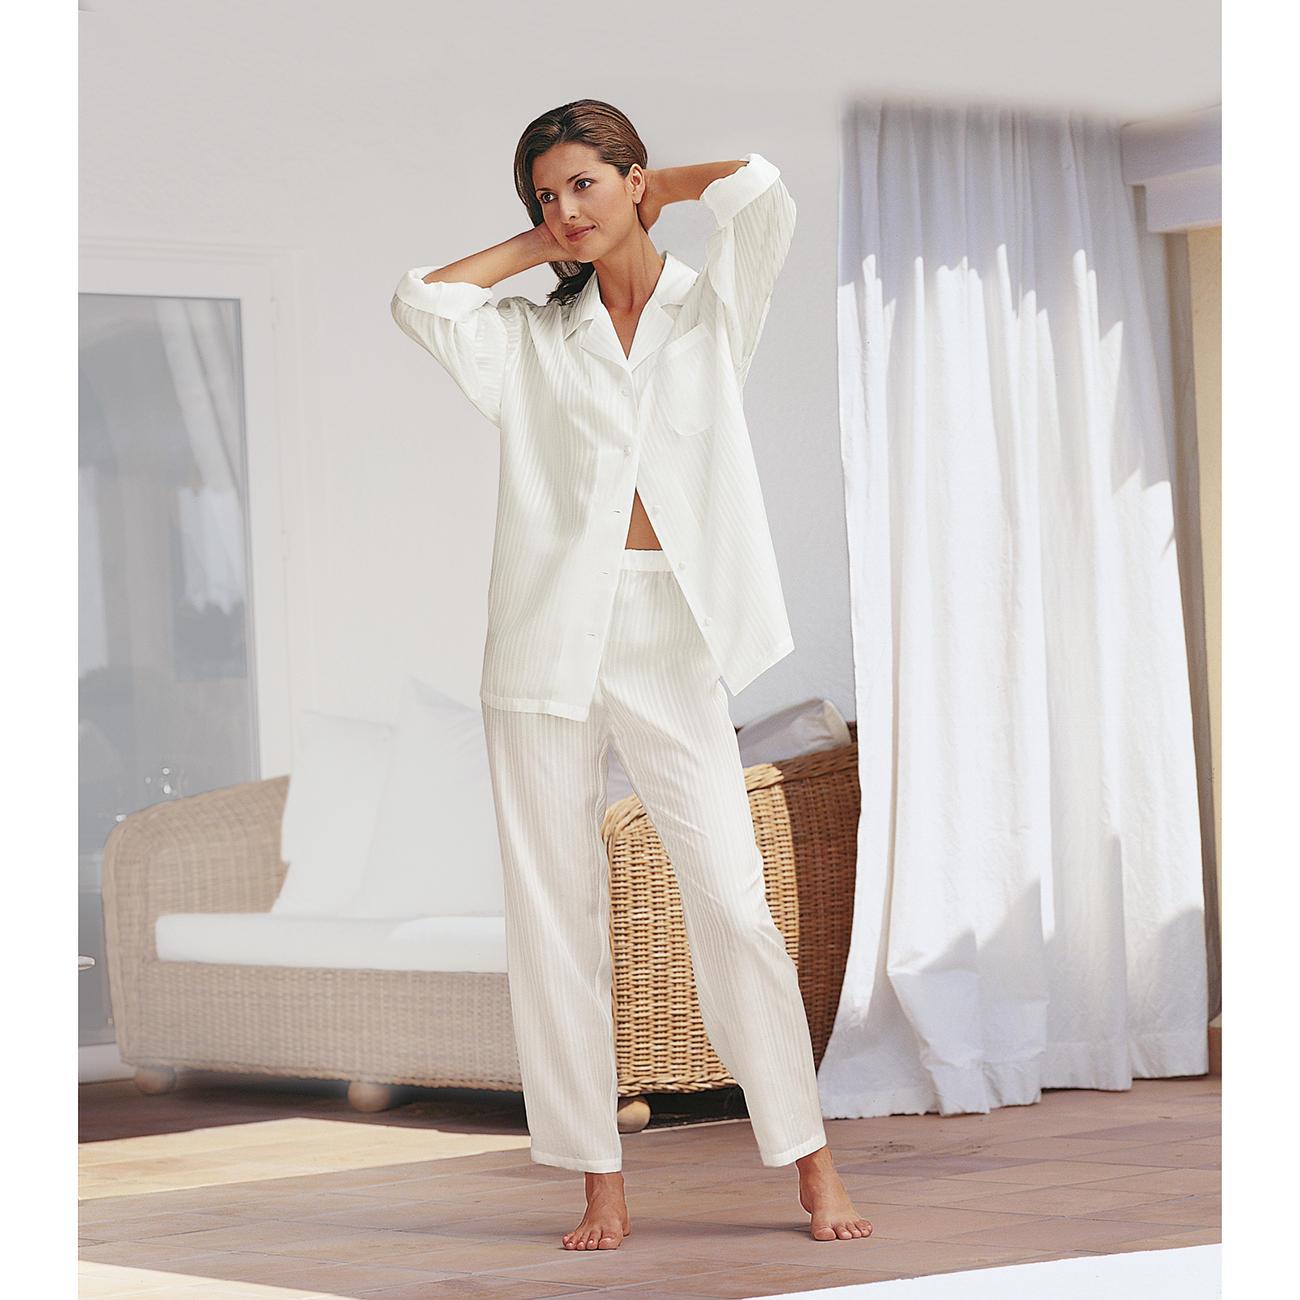 acheter pyjama en soie avec pochette en ligne pas cher. Black Bedroom Furniture Sets. Home Design Ideas